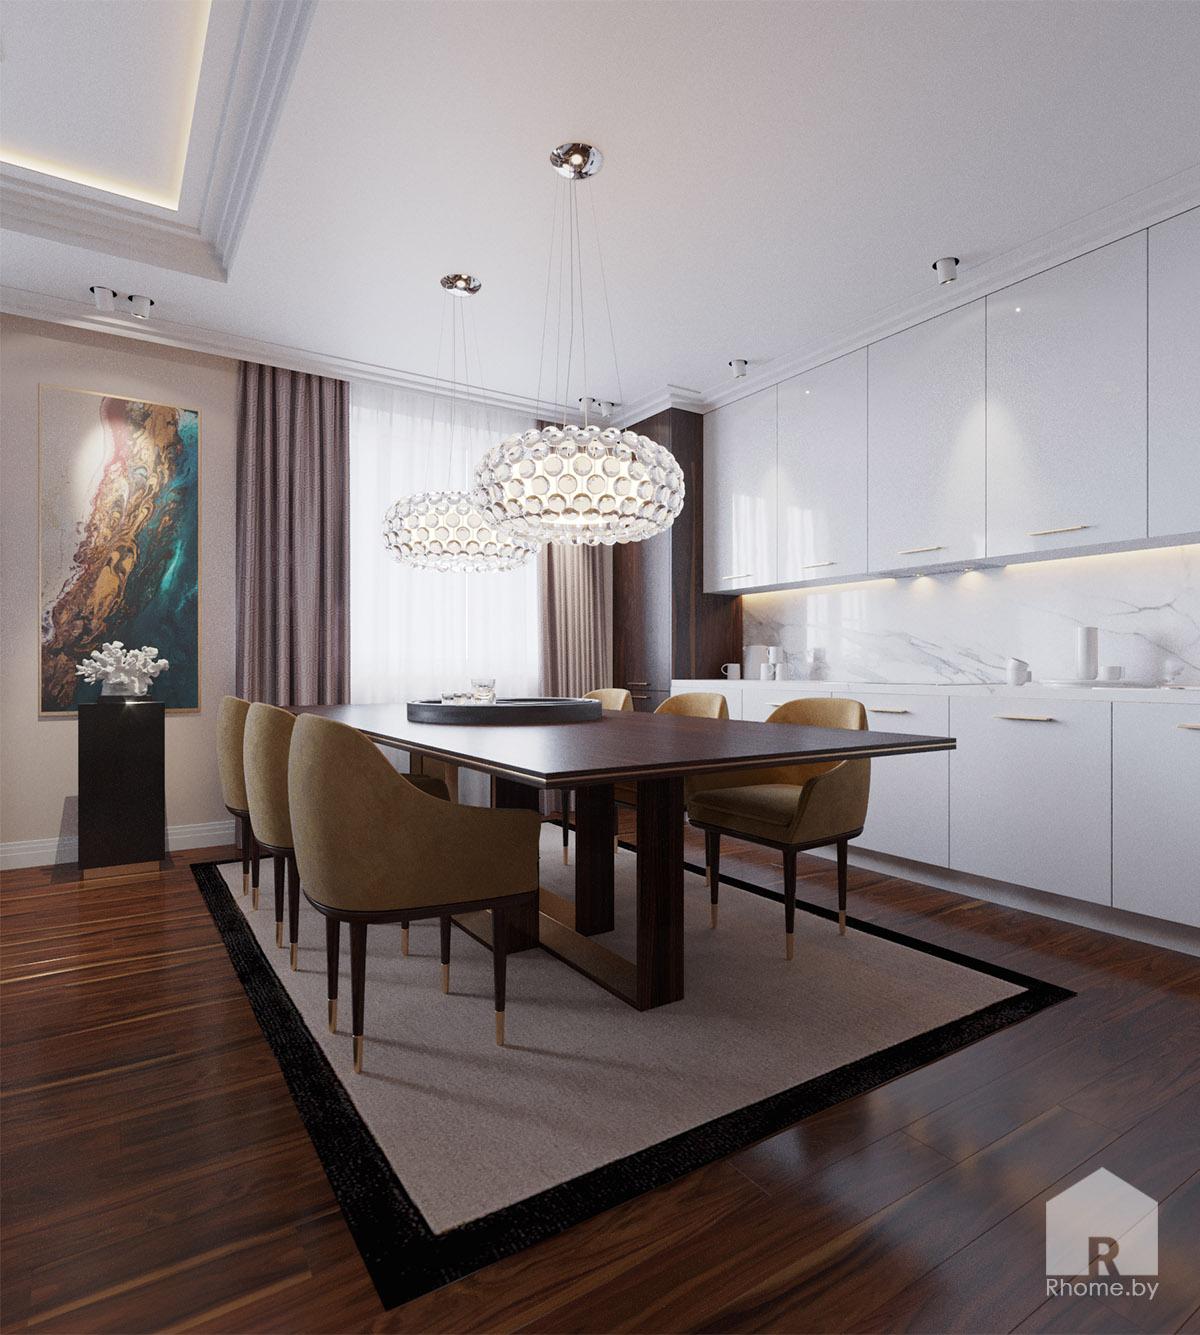 Дизайн кухни по ул. Восточная | Дизайн студия – Rhome.by